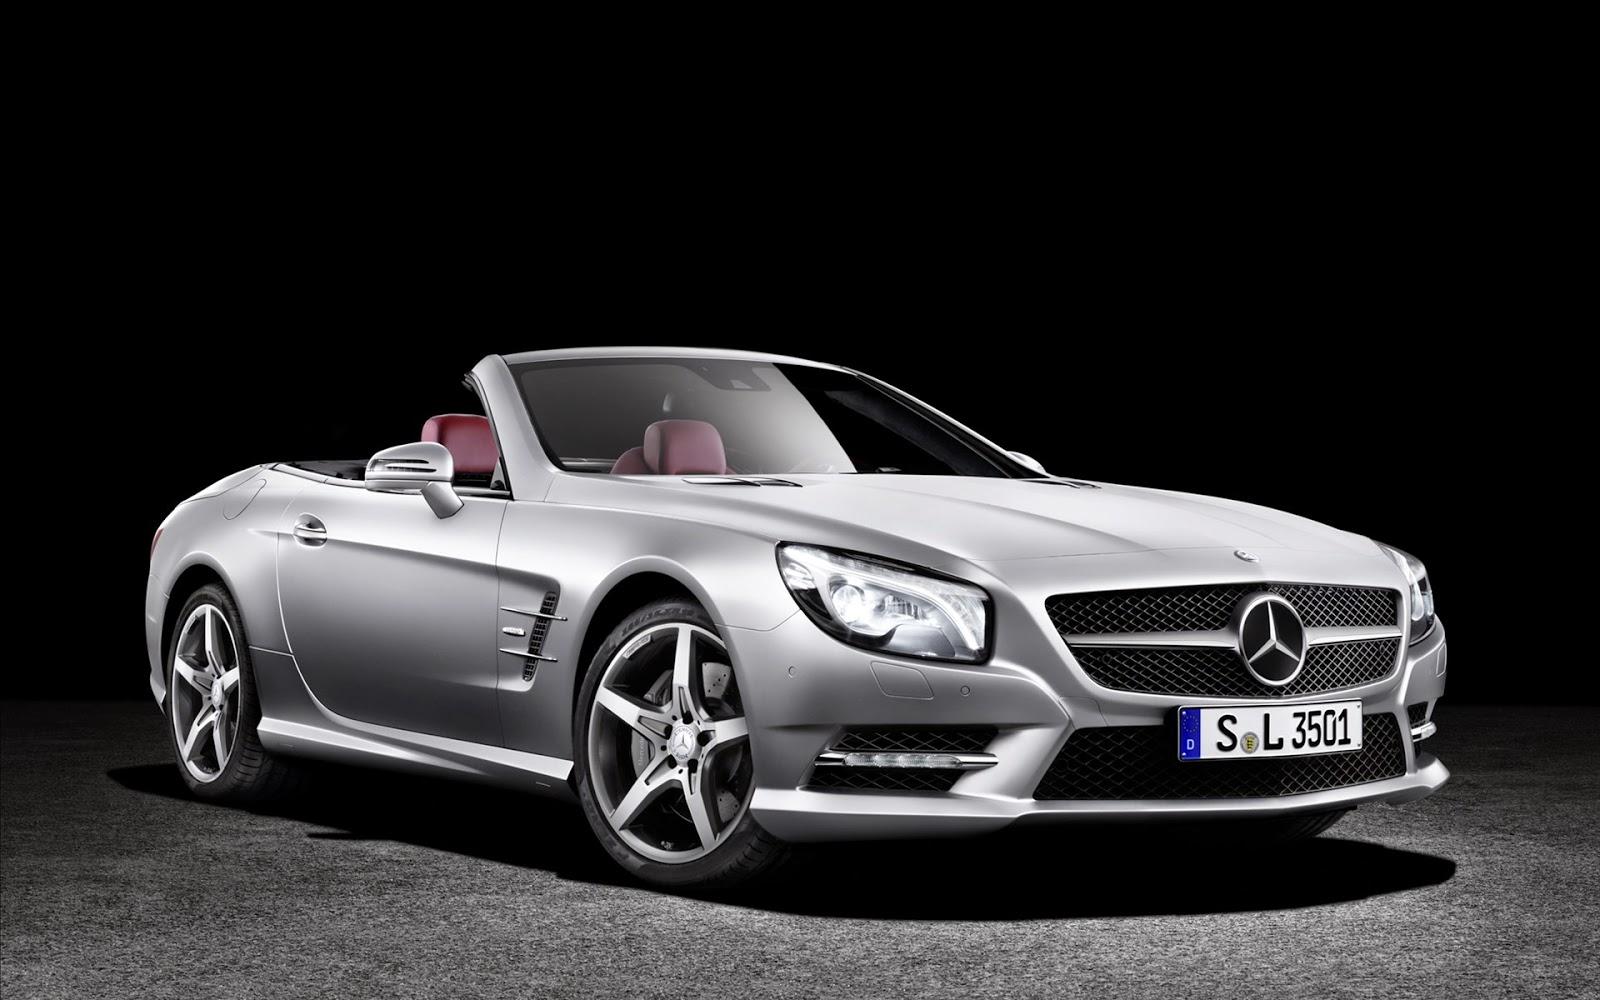 http://www.autocarsinfo.com/2014/09/mercedes-benz-sl-class-2013-free.html